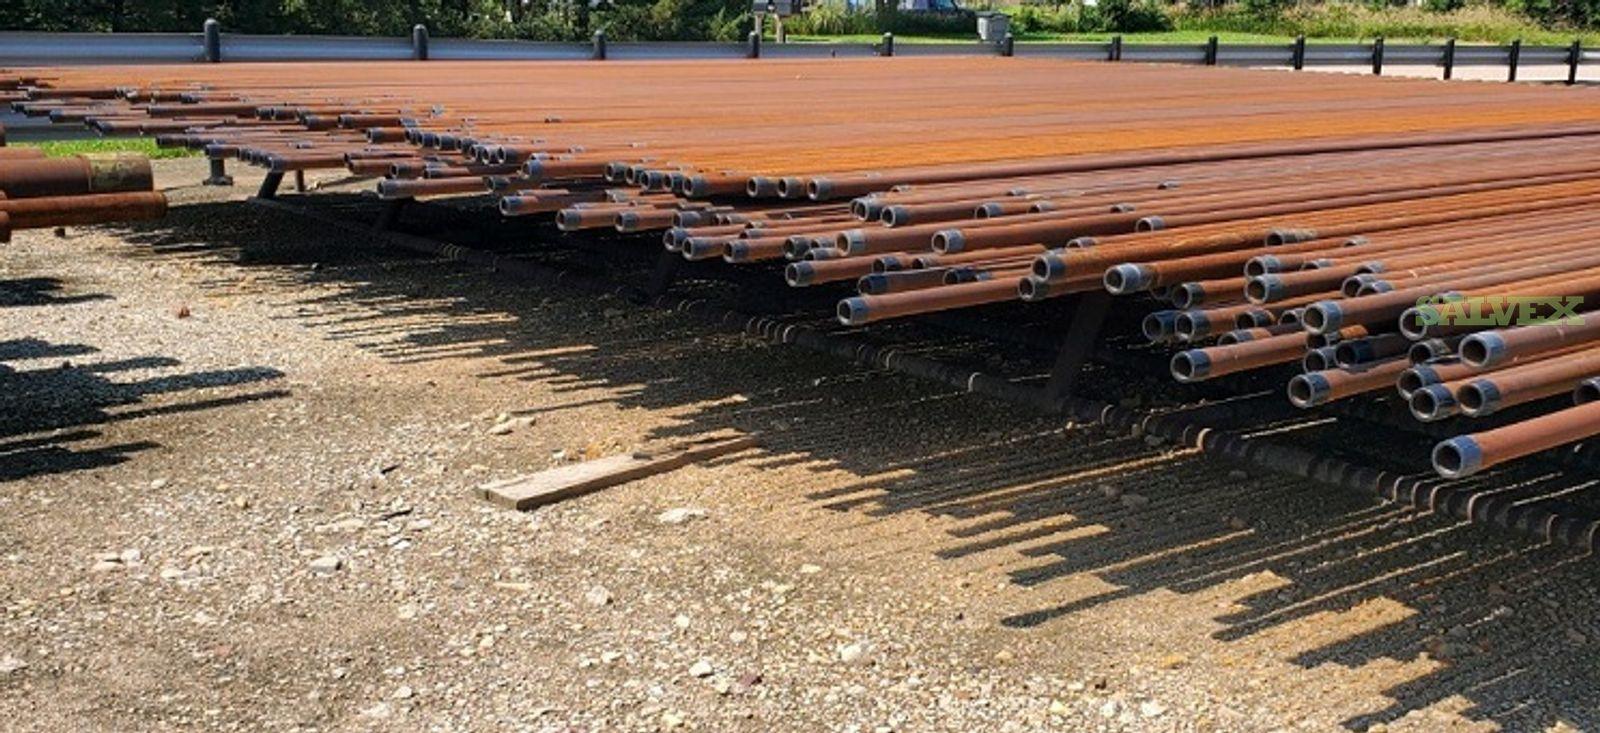 2 3/8 4.7# J55 R2 Structural Tubing (16,275 Feet / 35 Metric Tons)